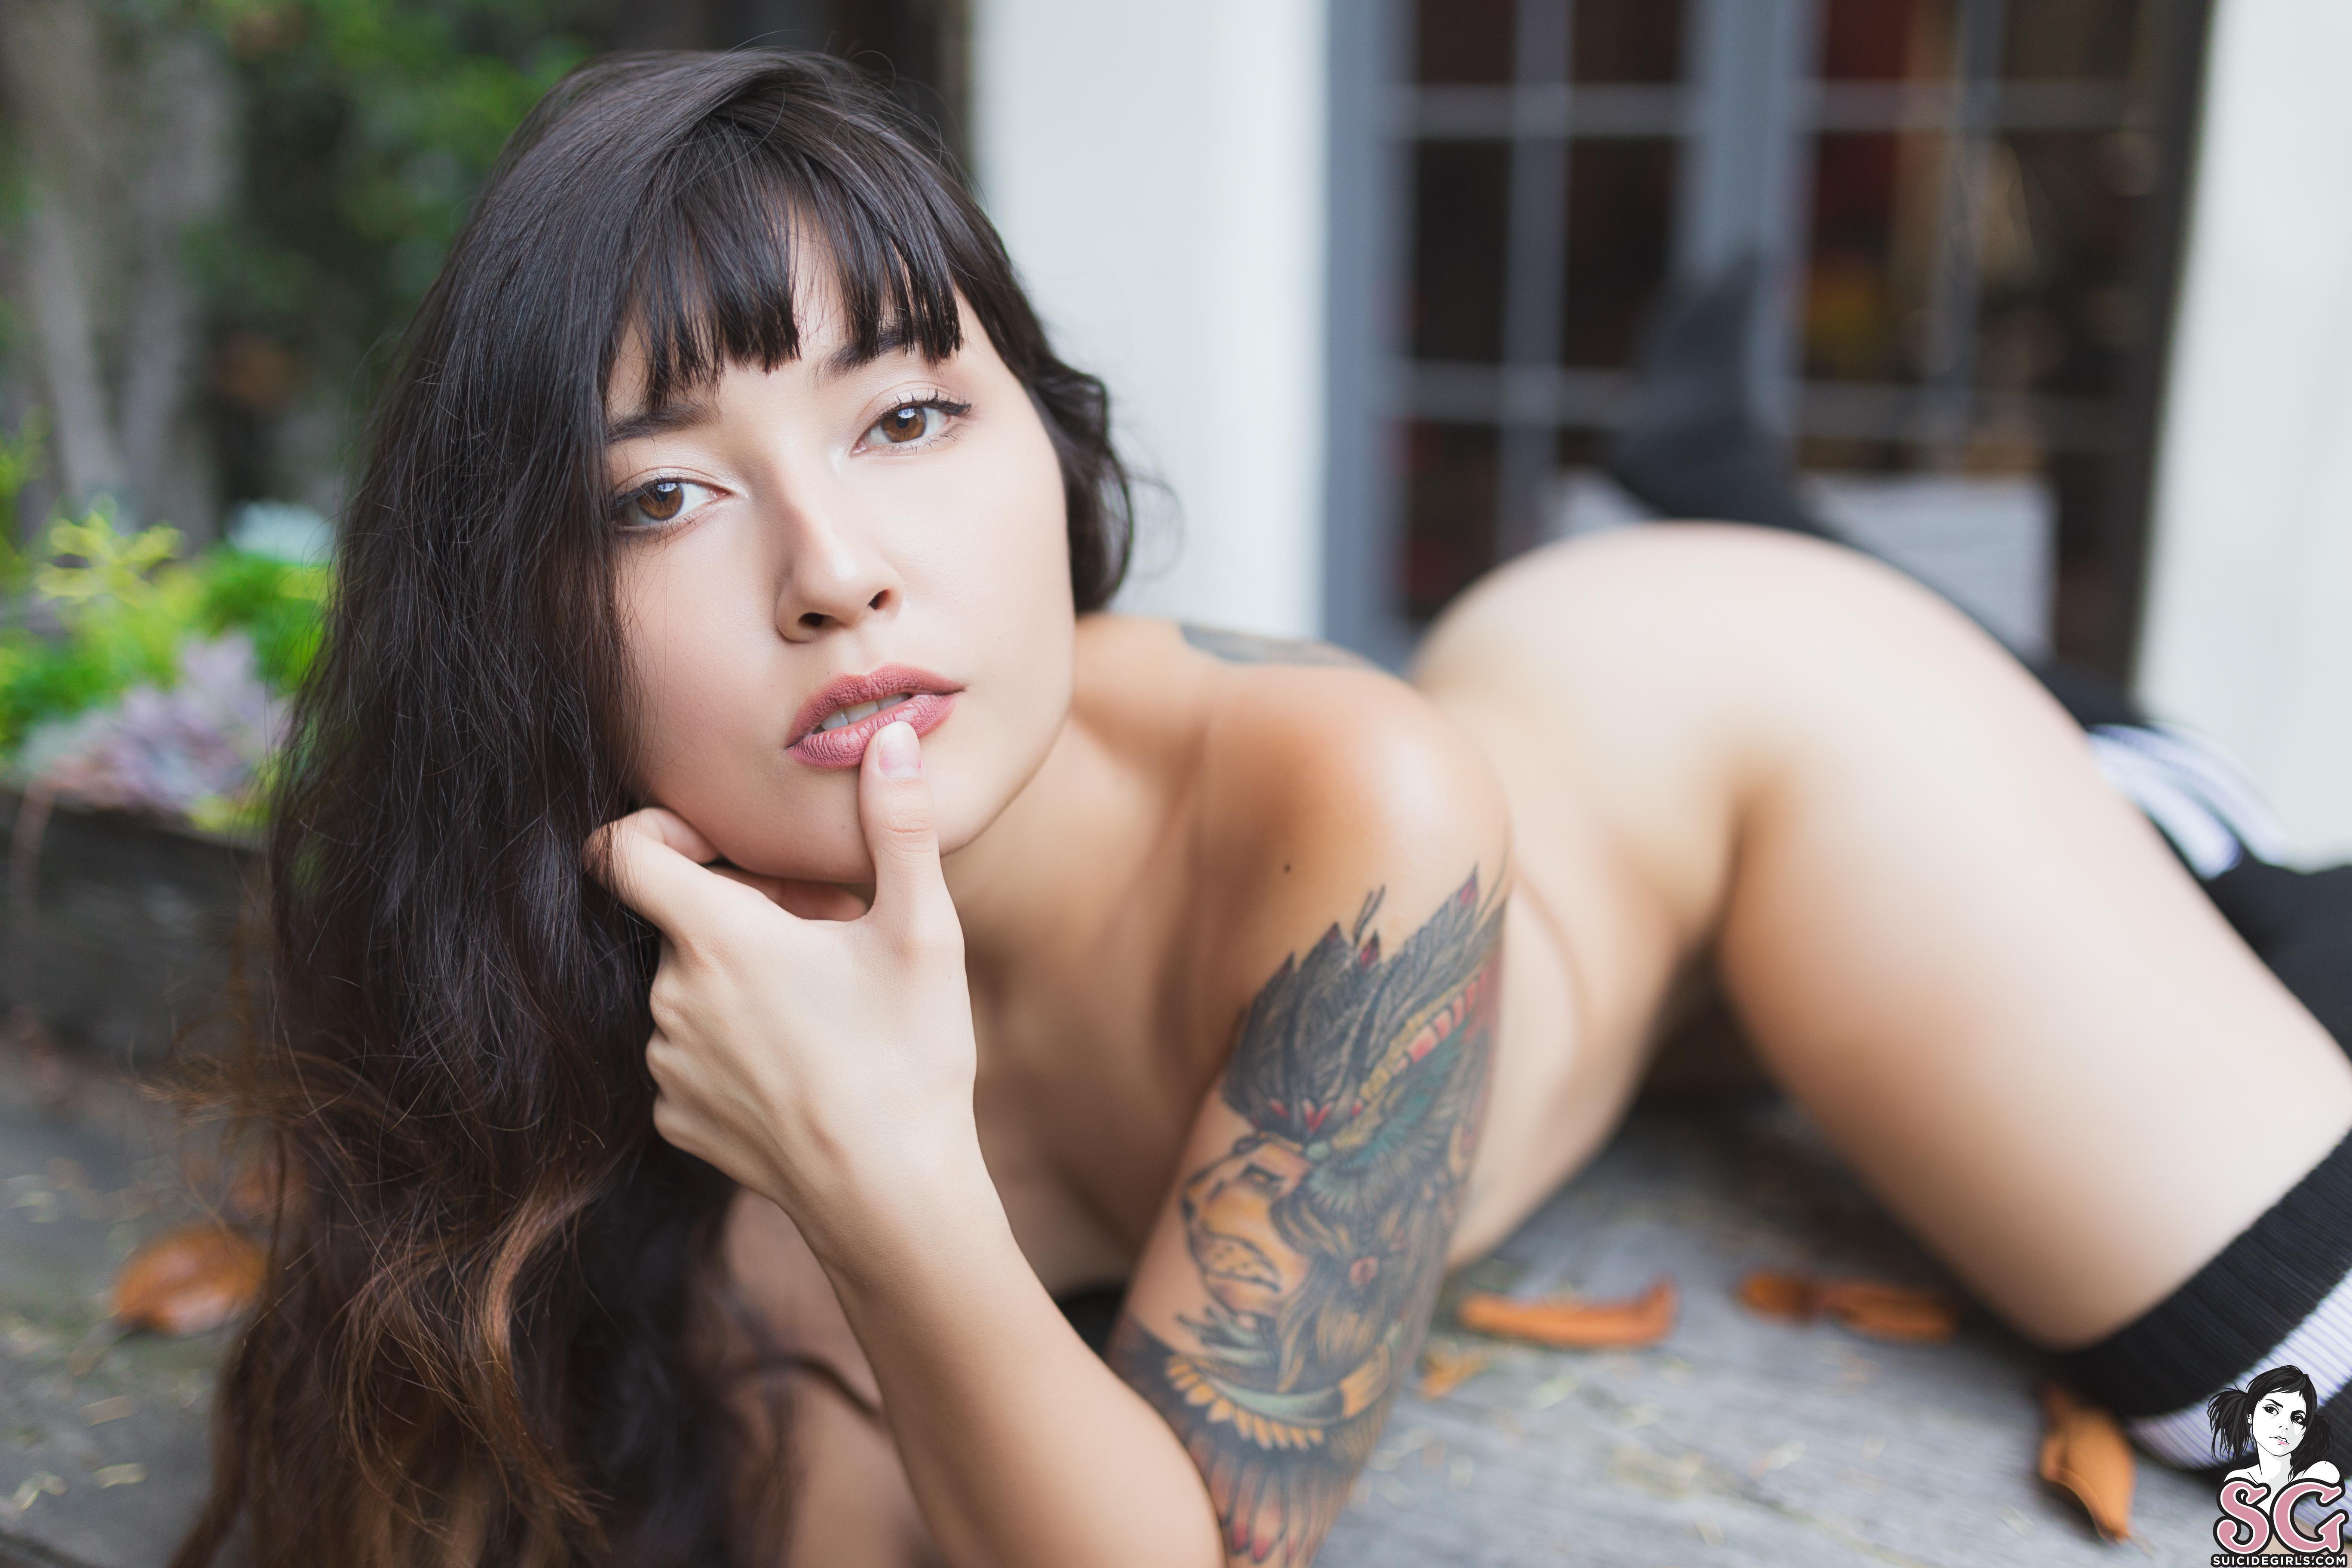 Allis Suicide wallpaper : suicide girls, women, brunette, garden, tattoo